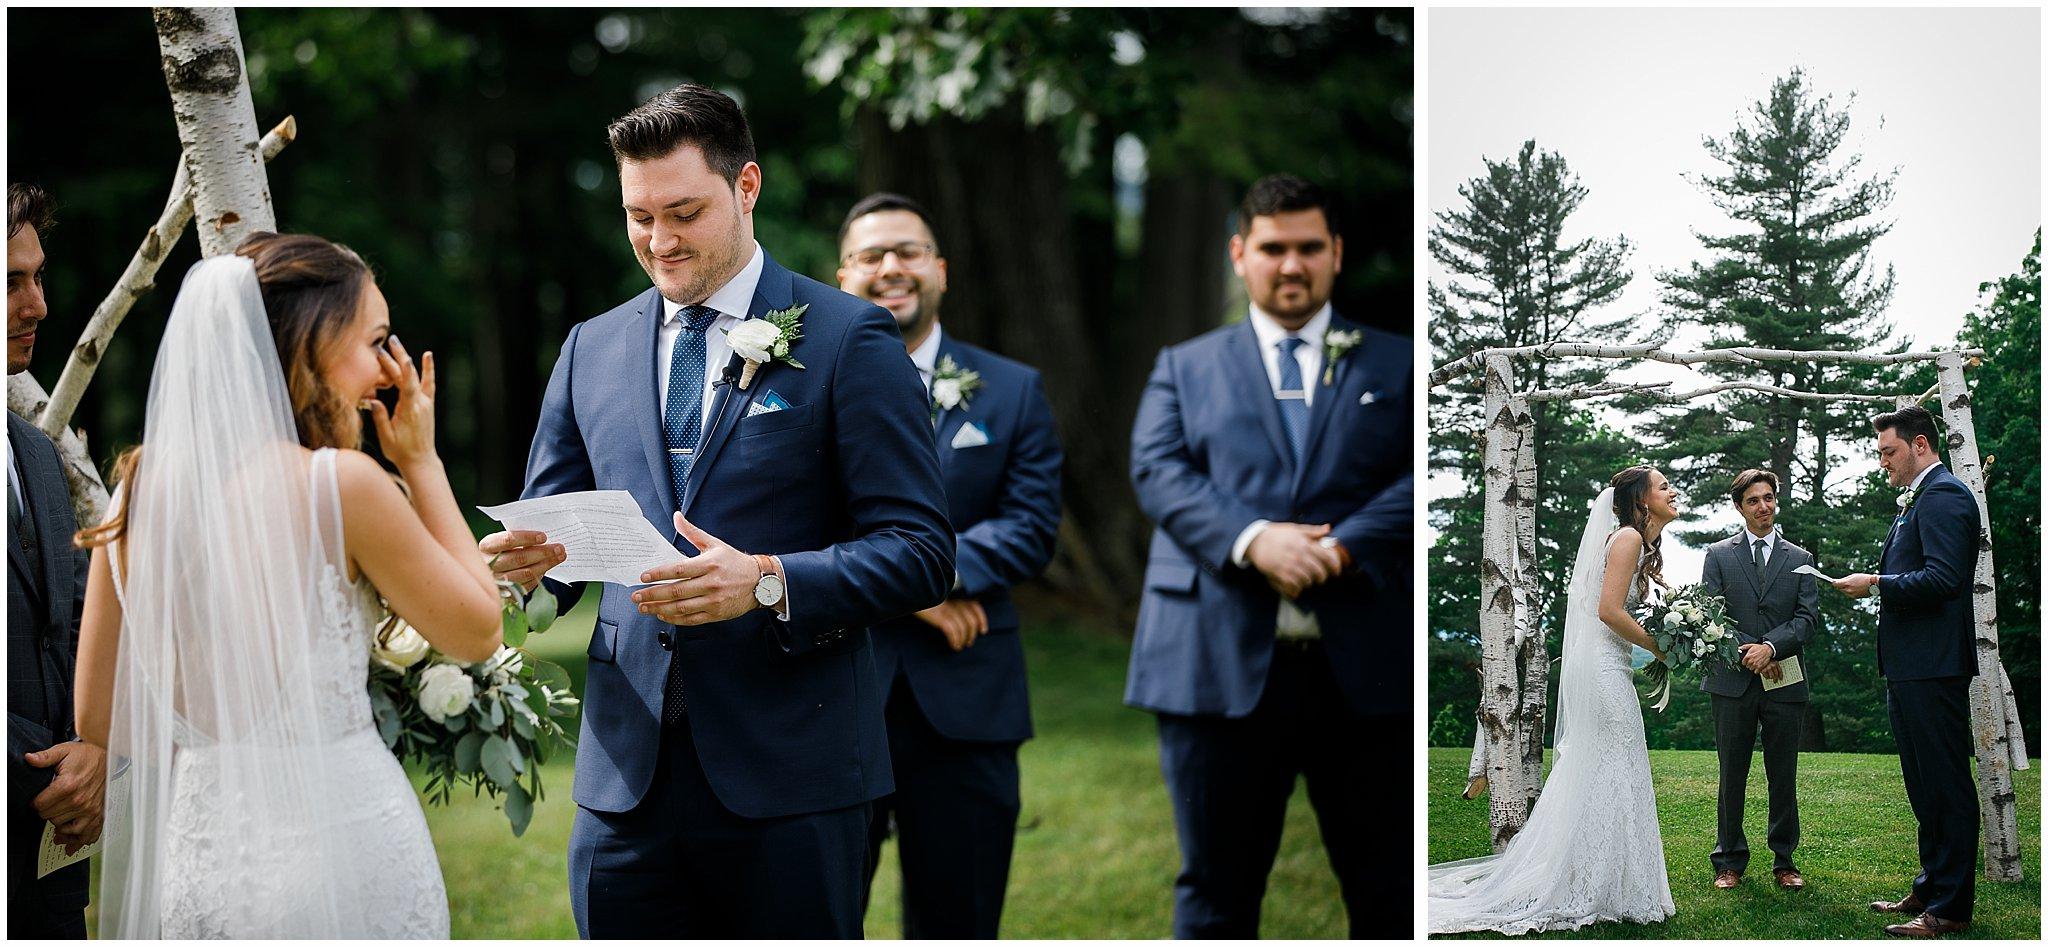 Hudson Valley Weddings at the Hill Hudson New York Wedding Photographer50.jpg